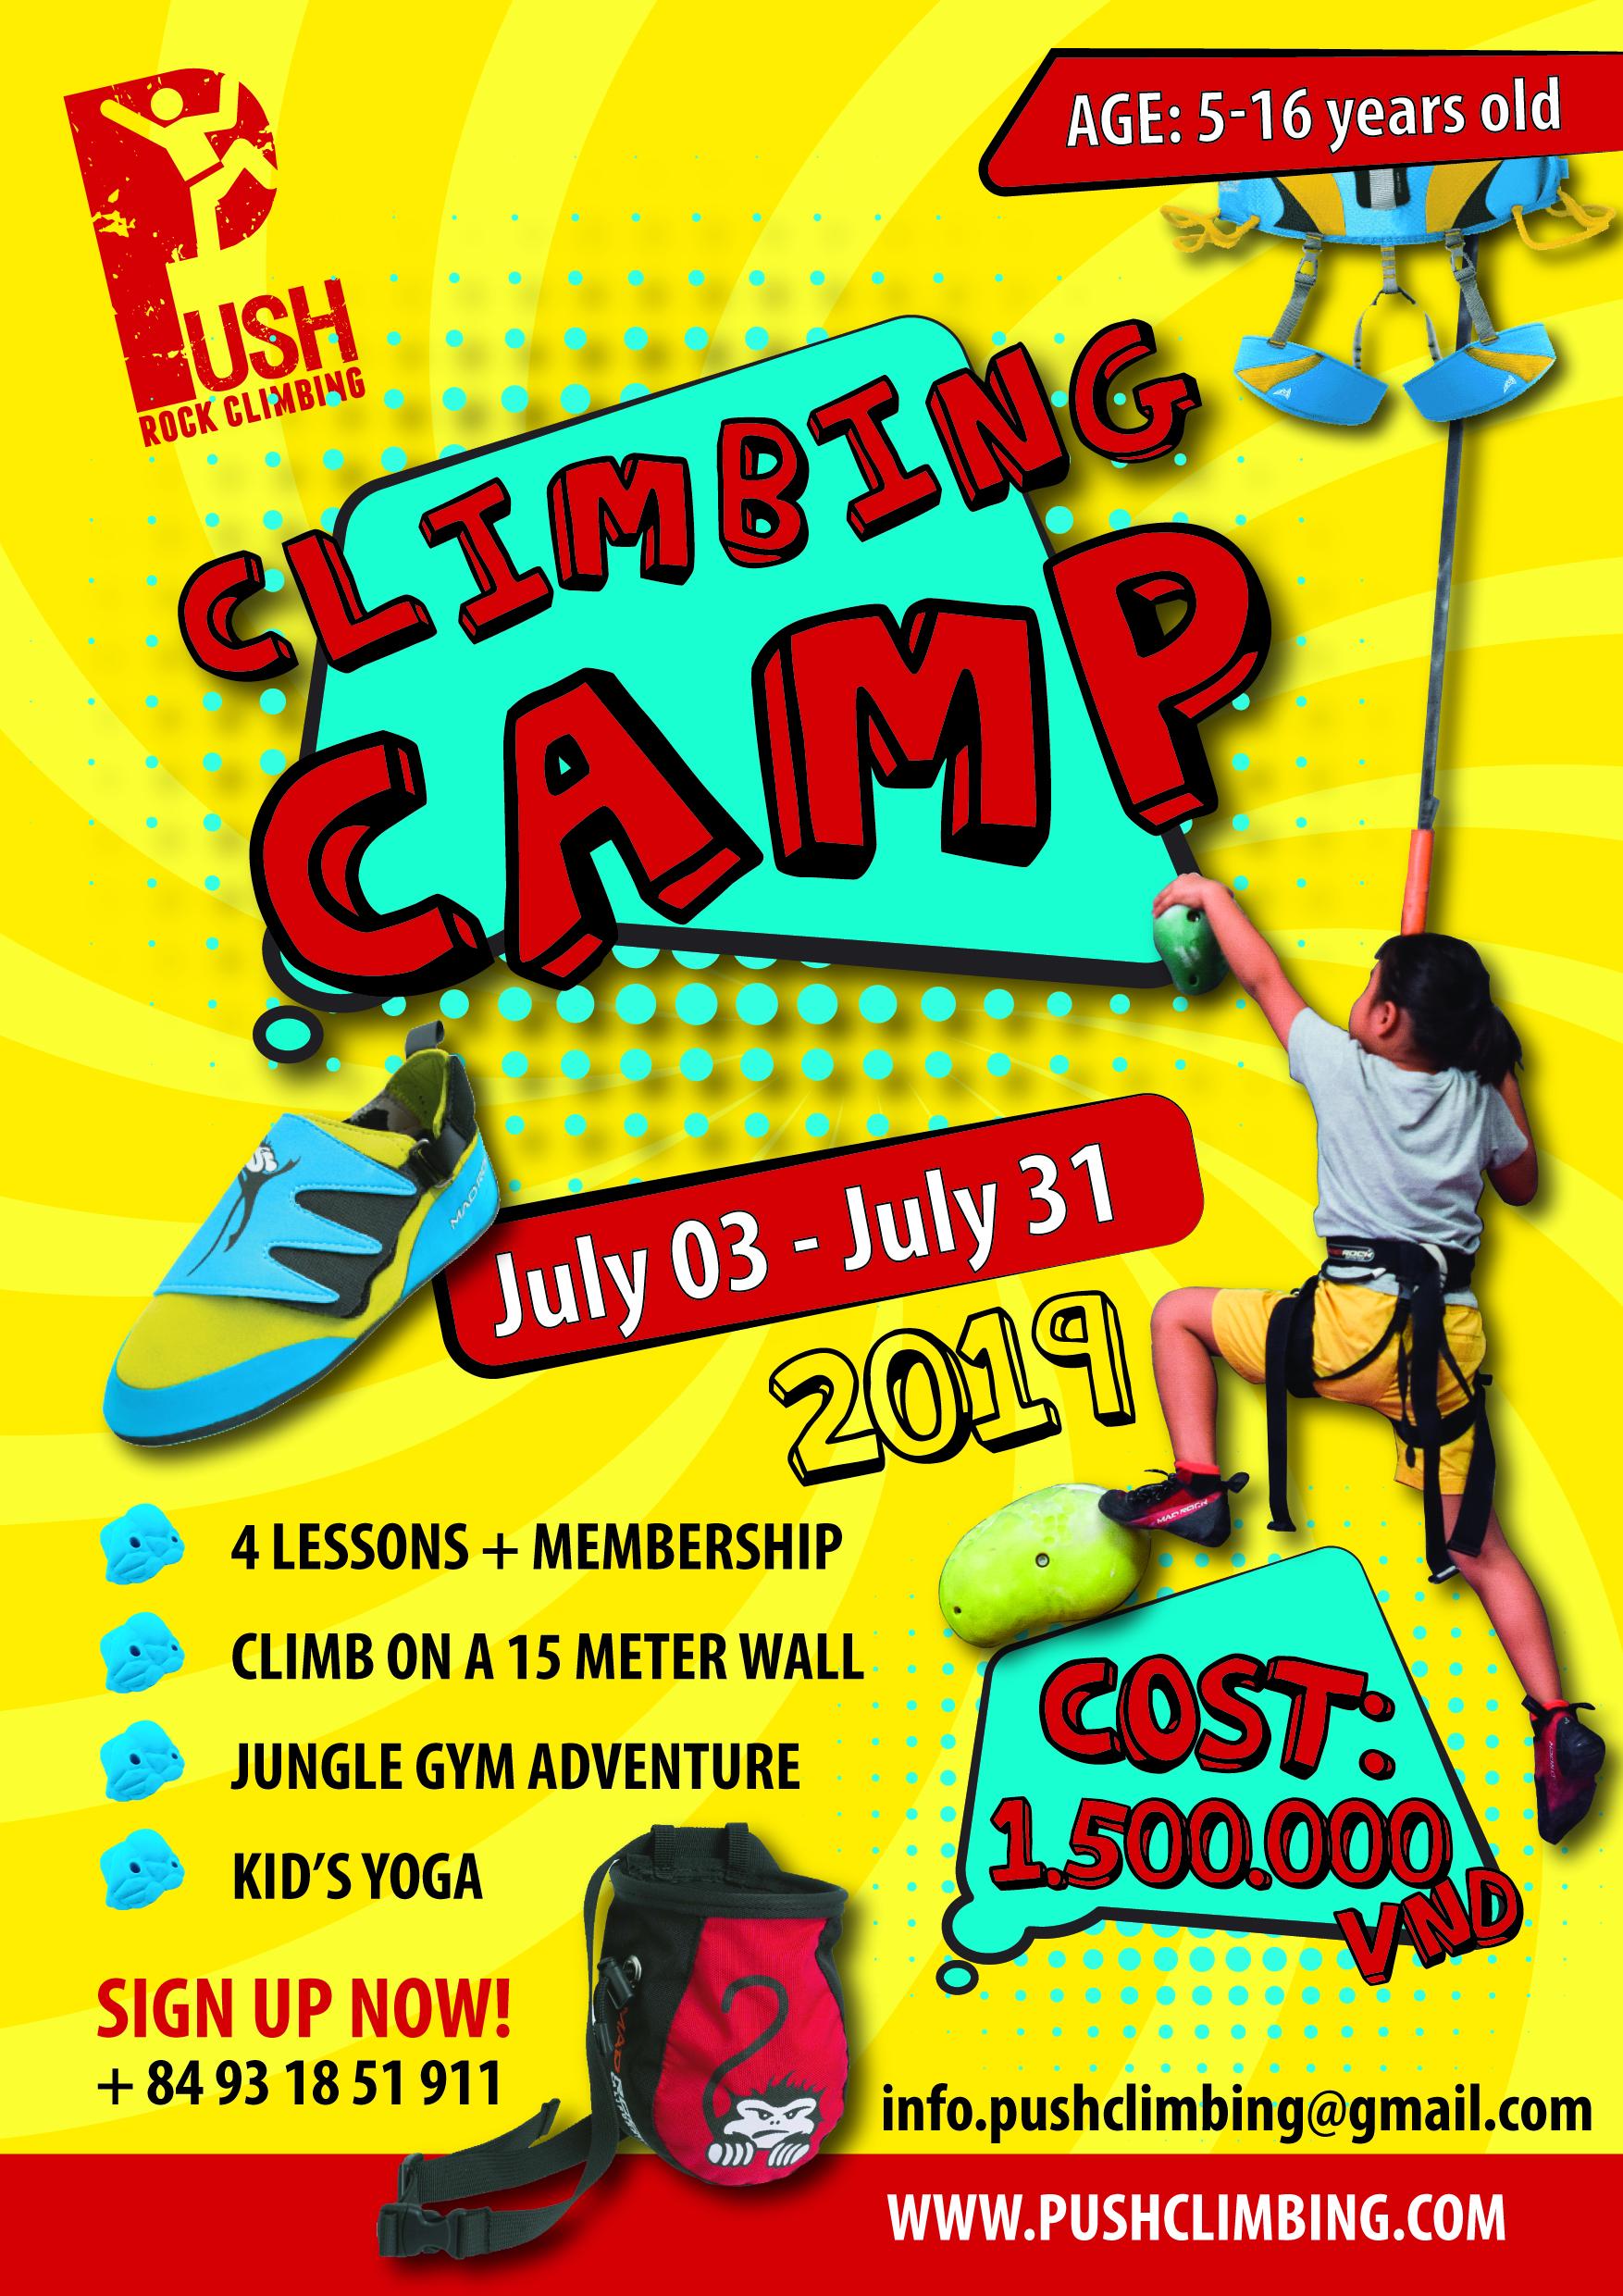 190611_EN_Summer camp poster_Summer camp.jpg